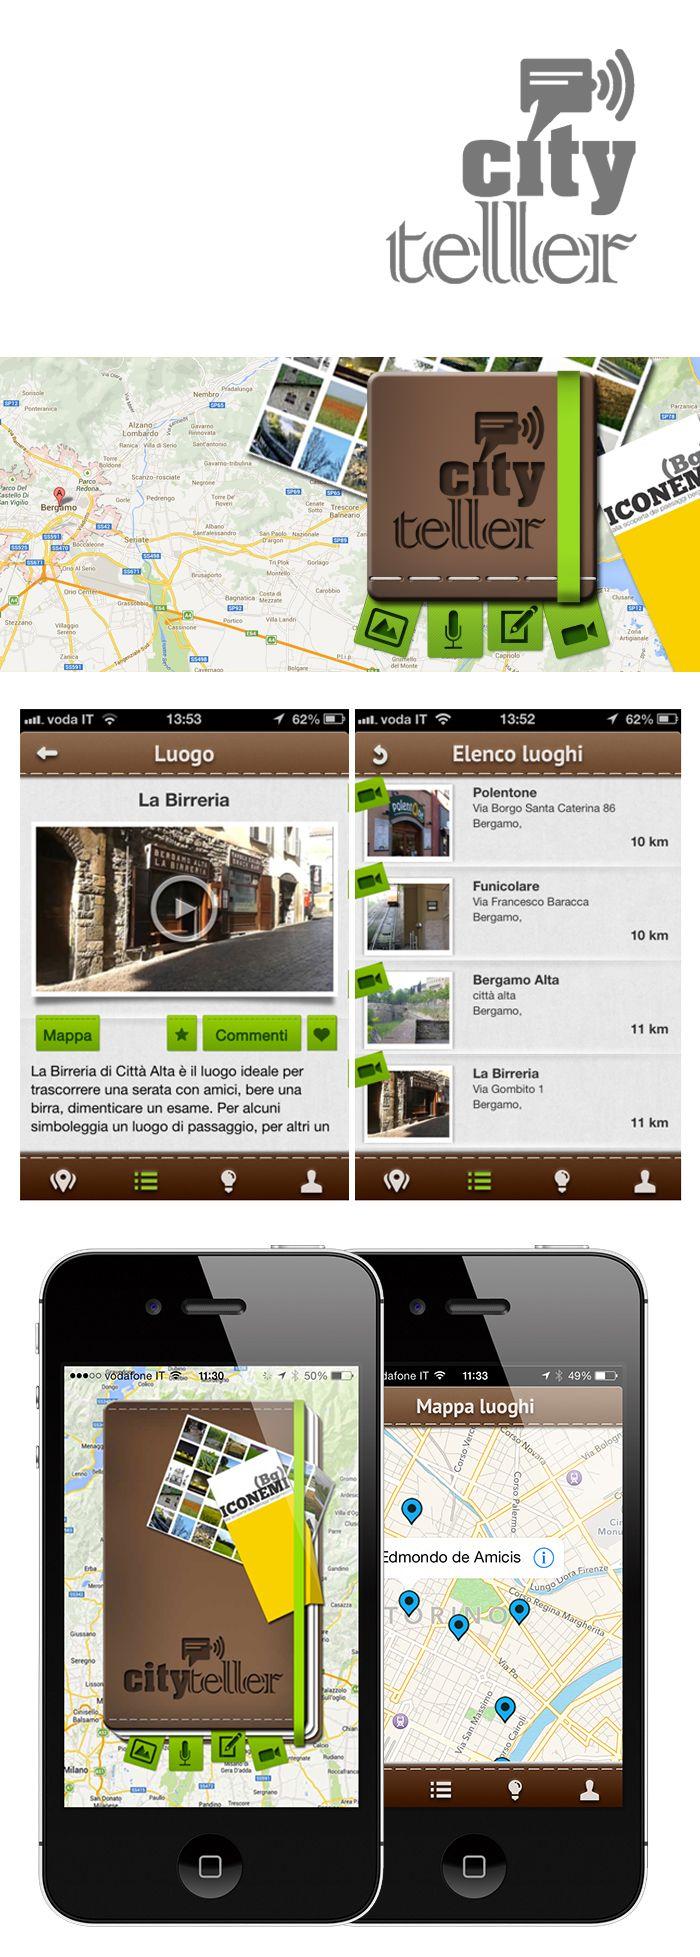 wwww.cityteller.it applogodesign by www.spectacularch.com idea by @Davide to-bg